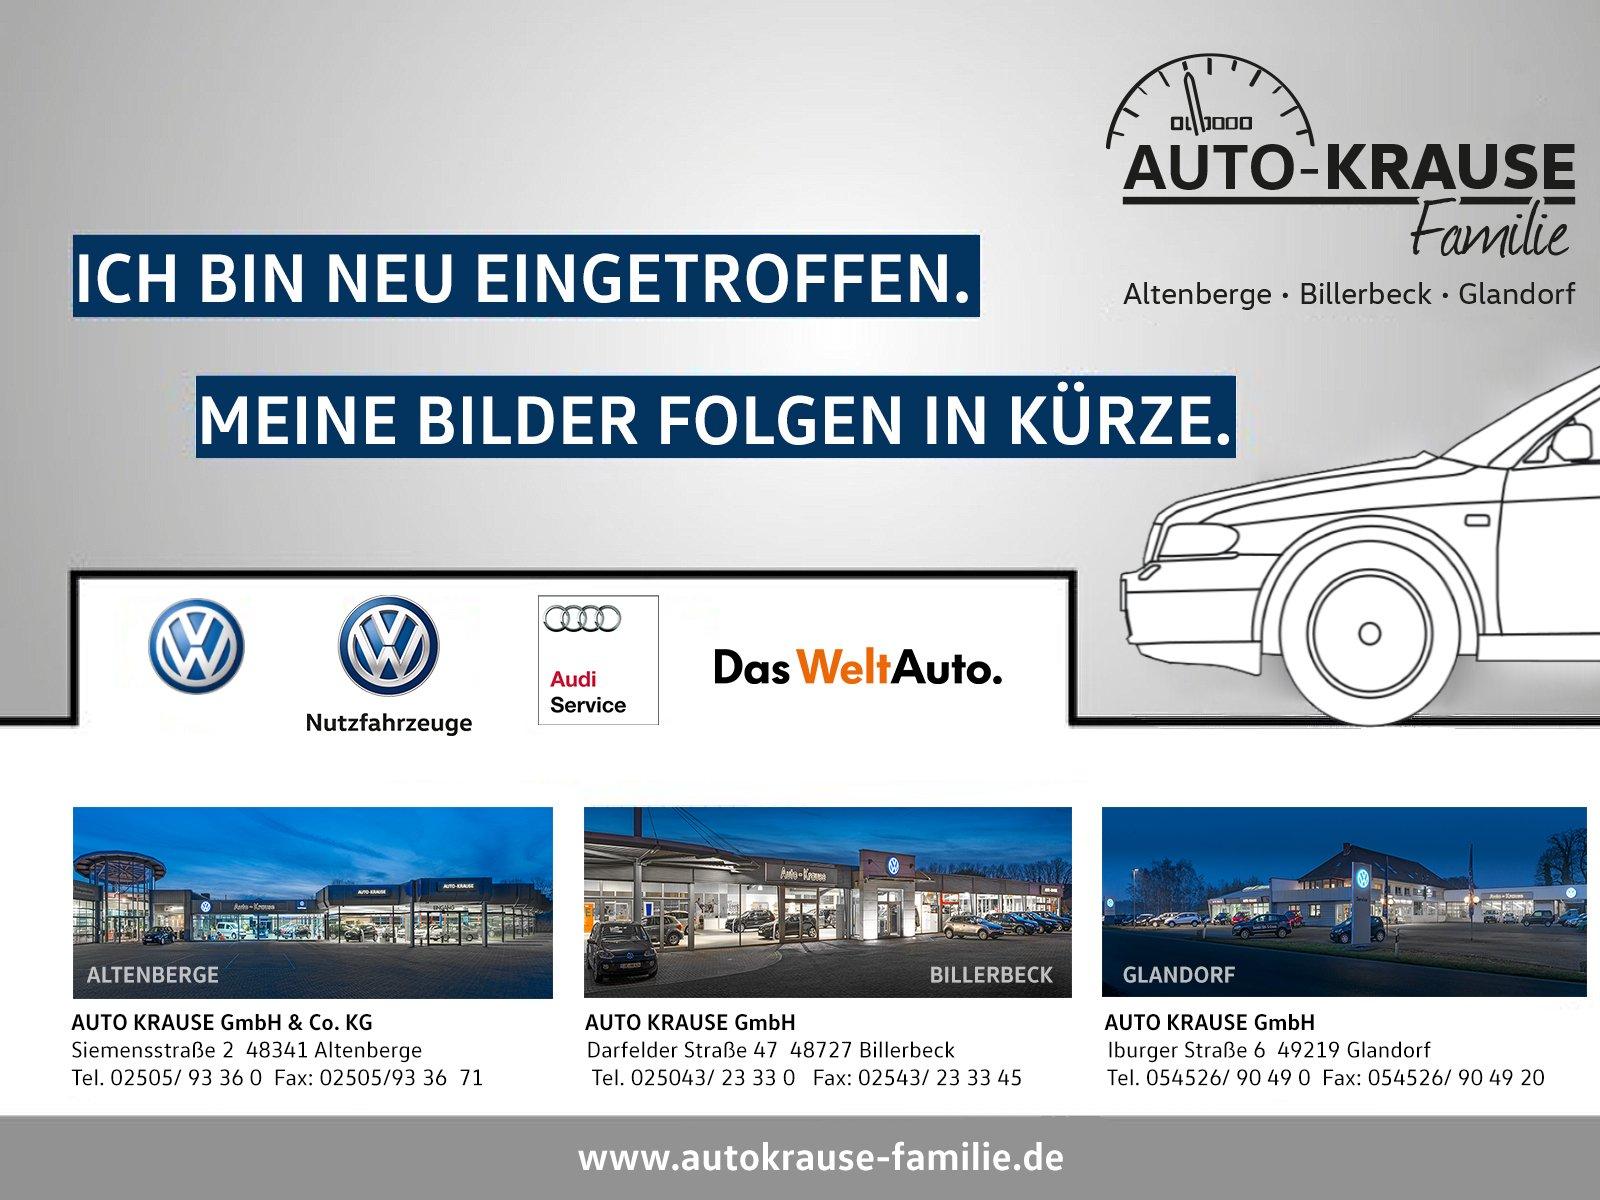 Audi S5 Cabriolet 3.0 TFSI quattro S Tronic, Navi,AHK, Jahr 2014, Benzin